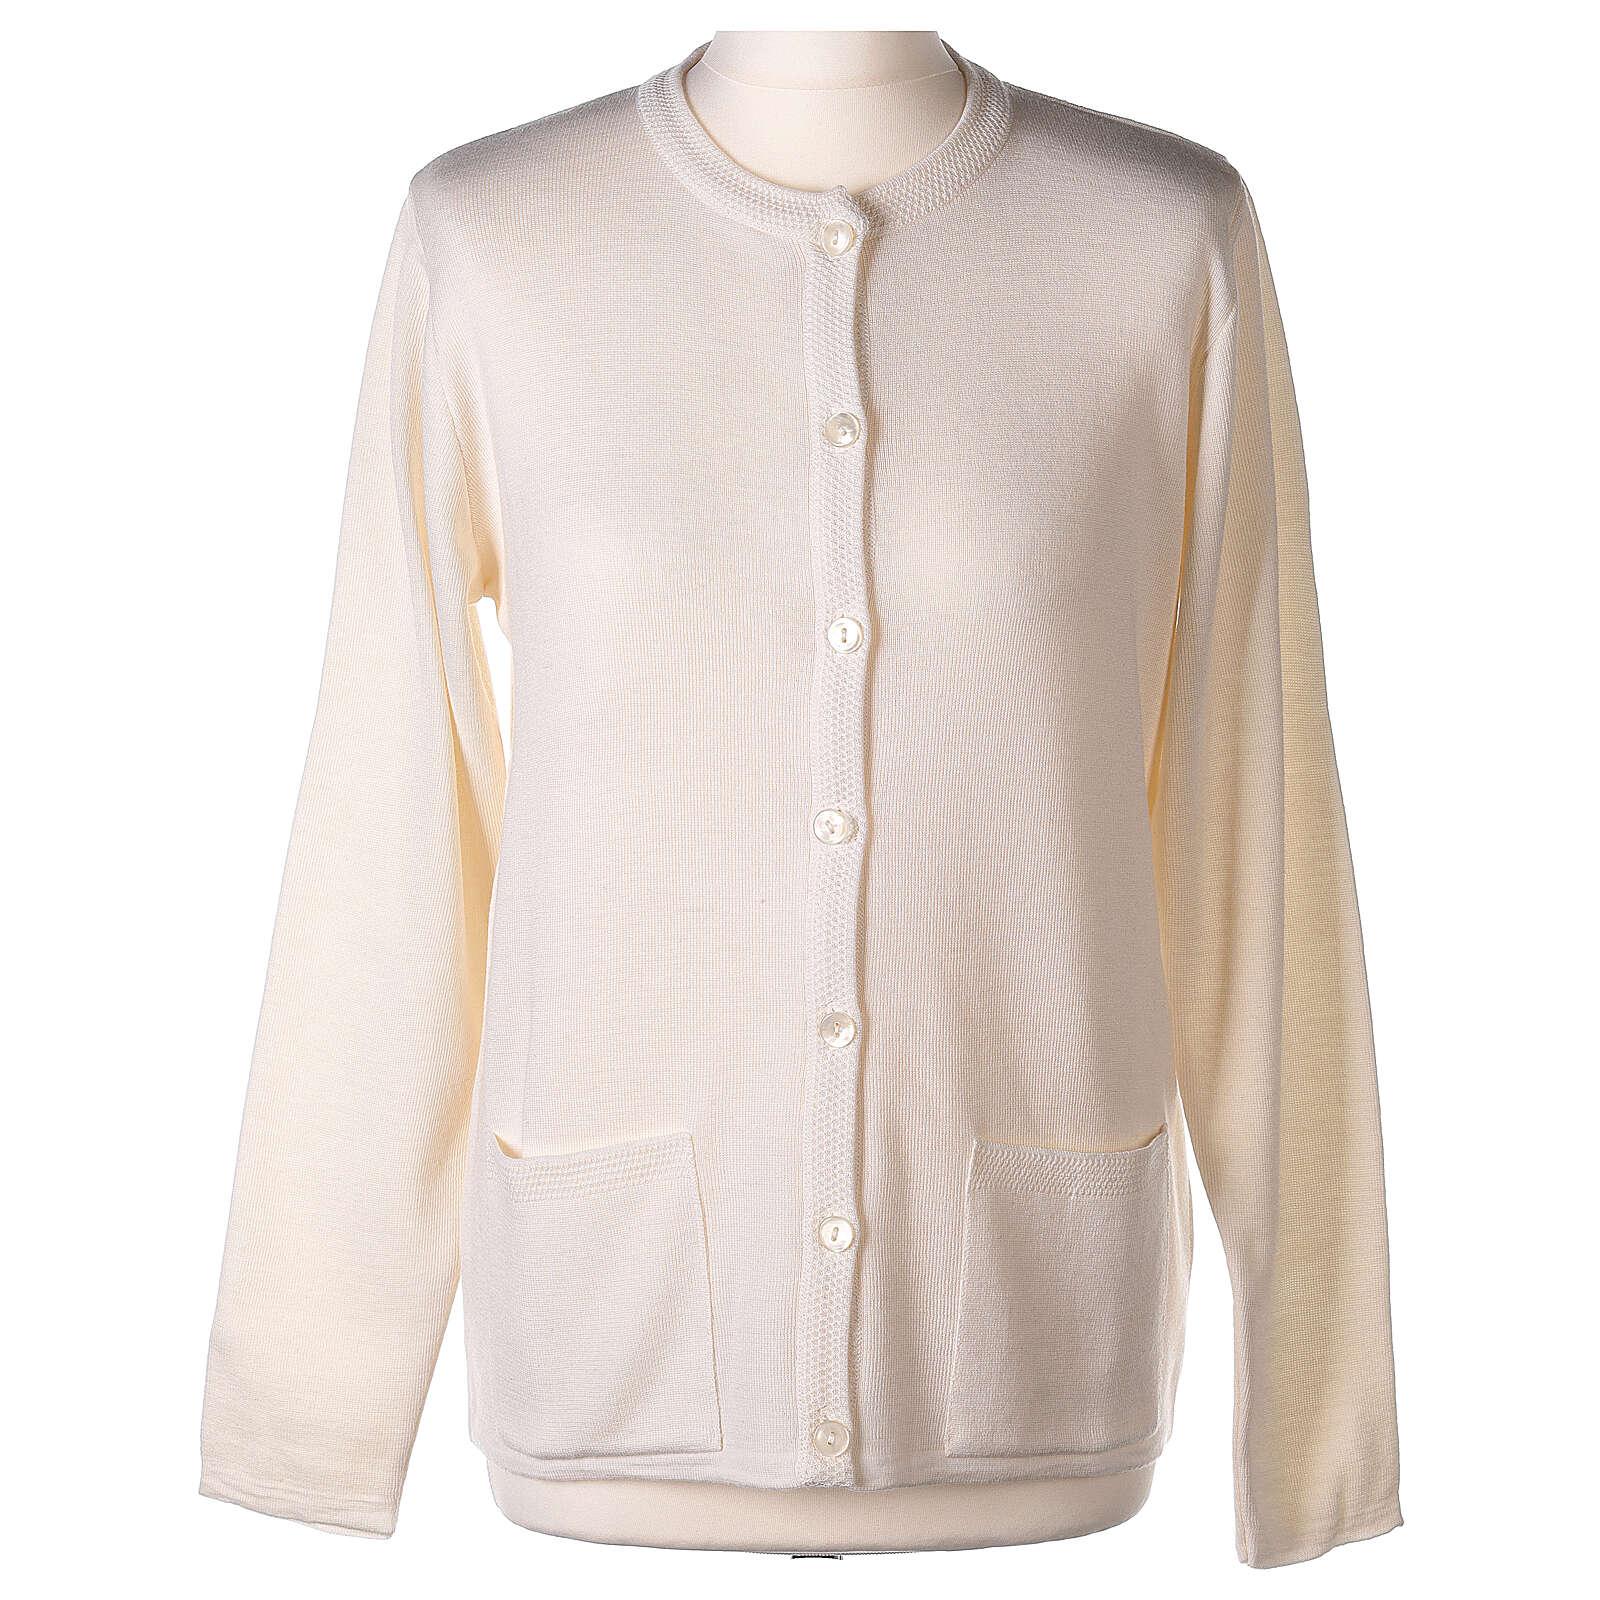 Cardigan blanc pour soeur col rond poches GRANDE TAILLE 50% acrylique 50% mérinos In Primis 4